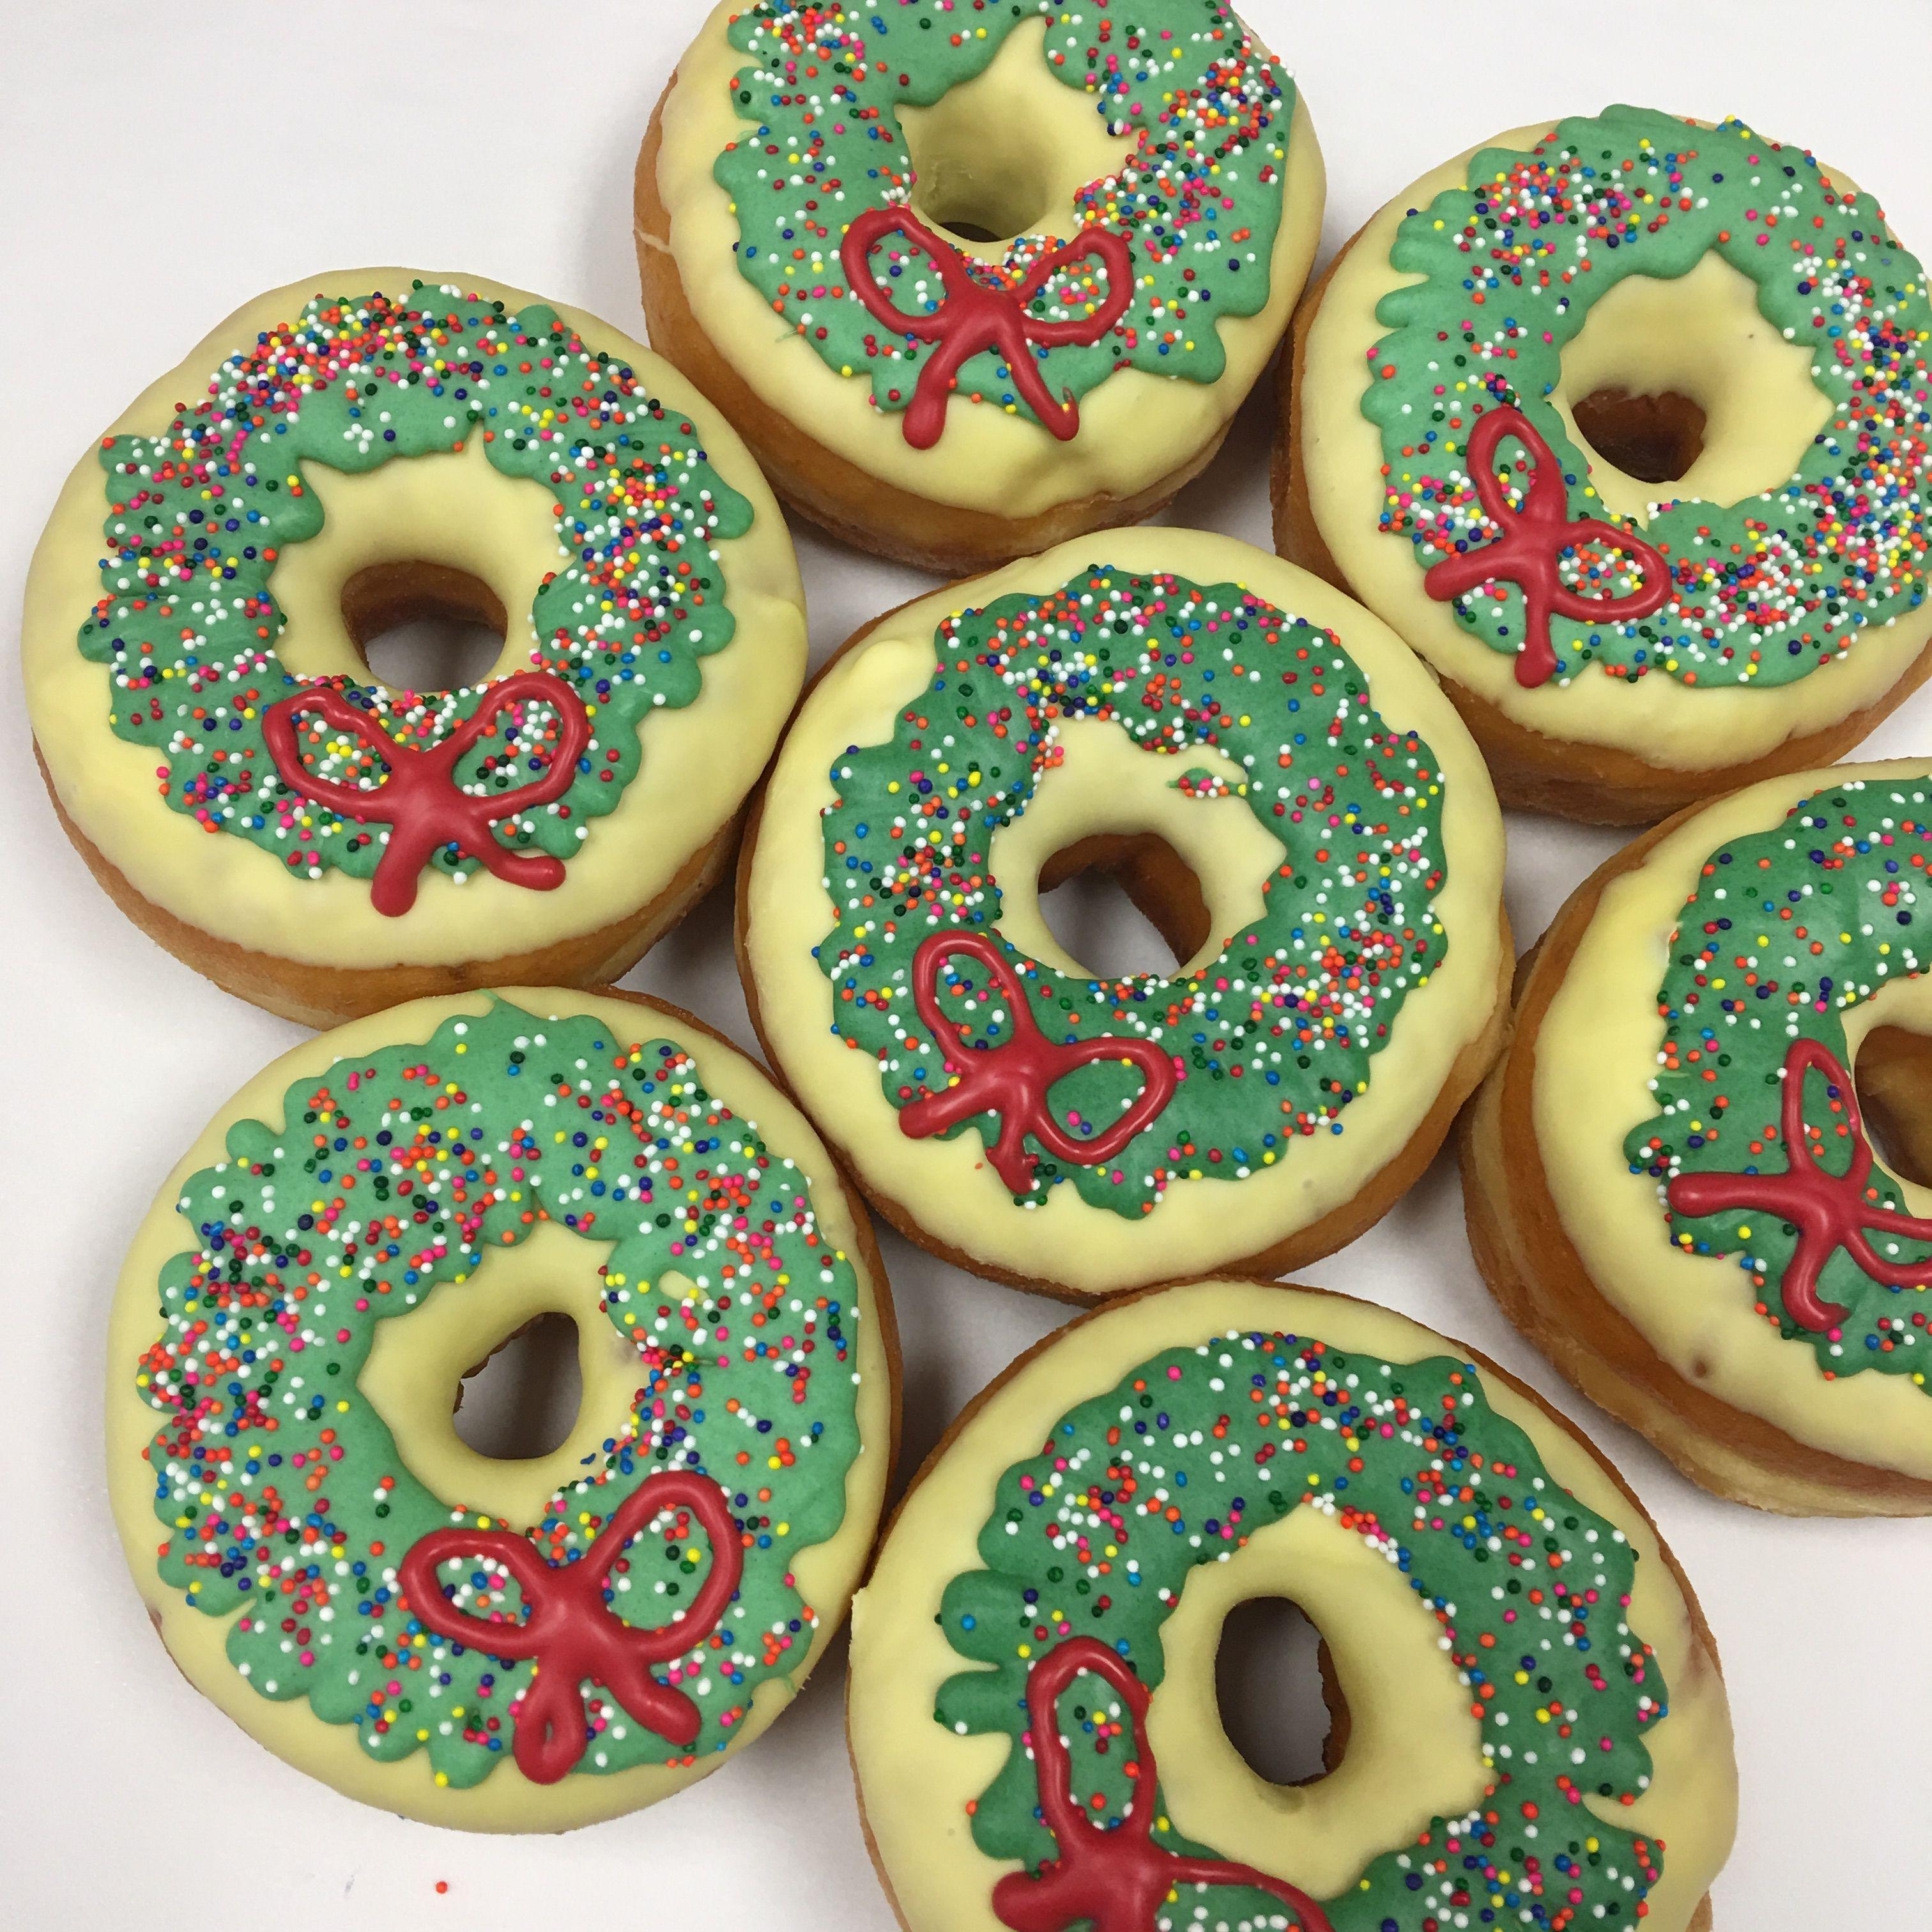 Wreath Christmas Donuts Christmas Donuts Christmas Food California Donuts